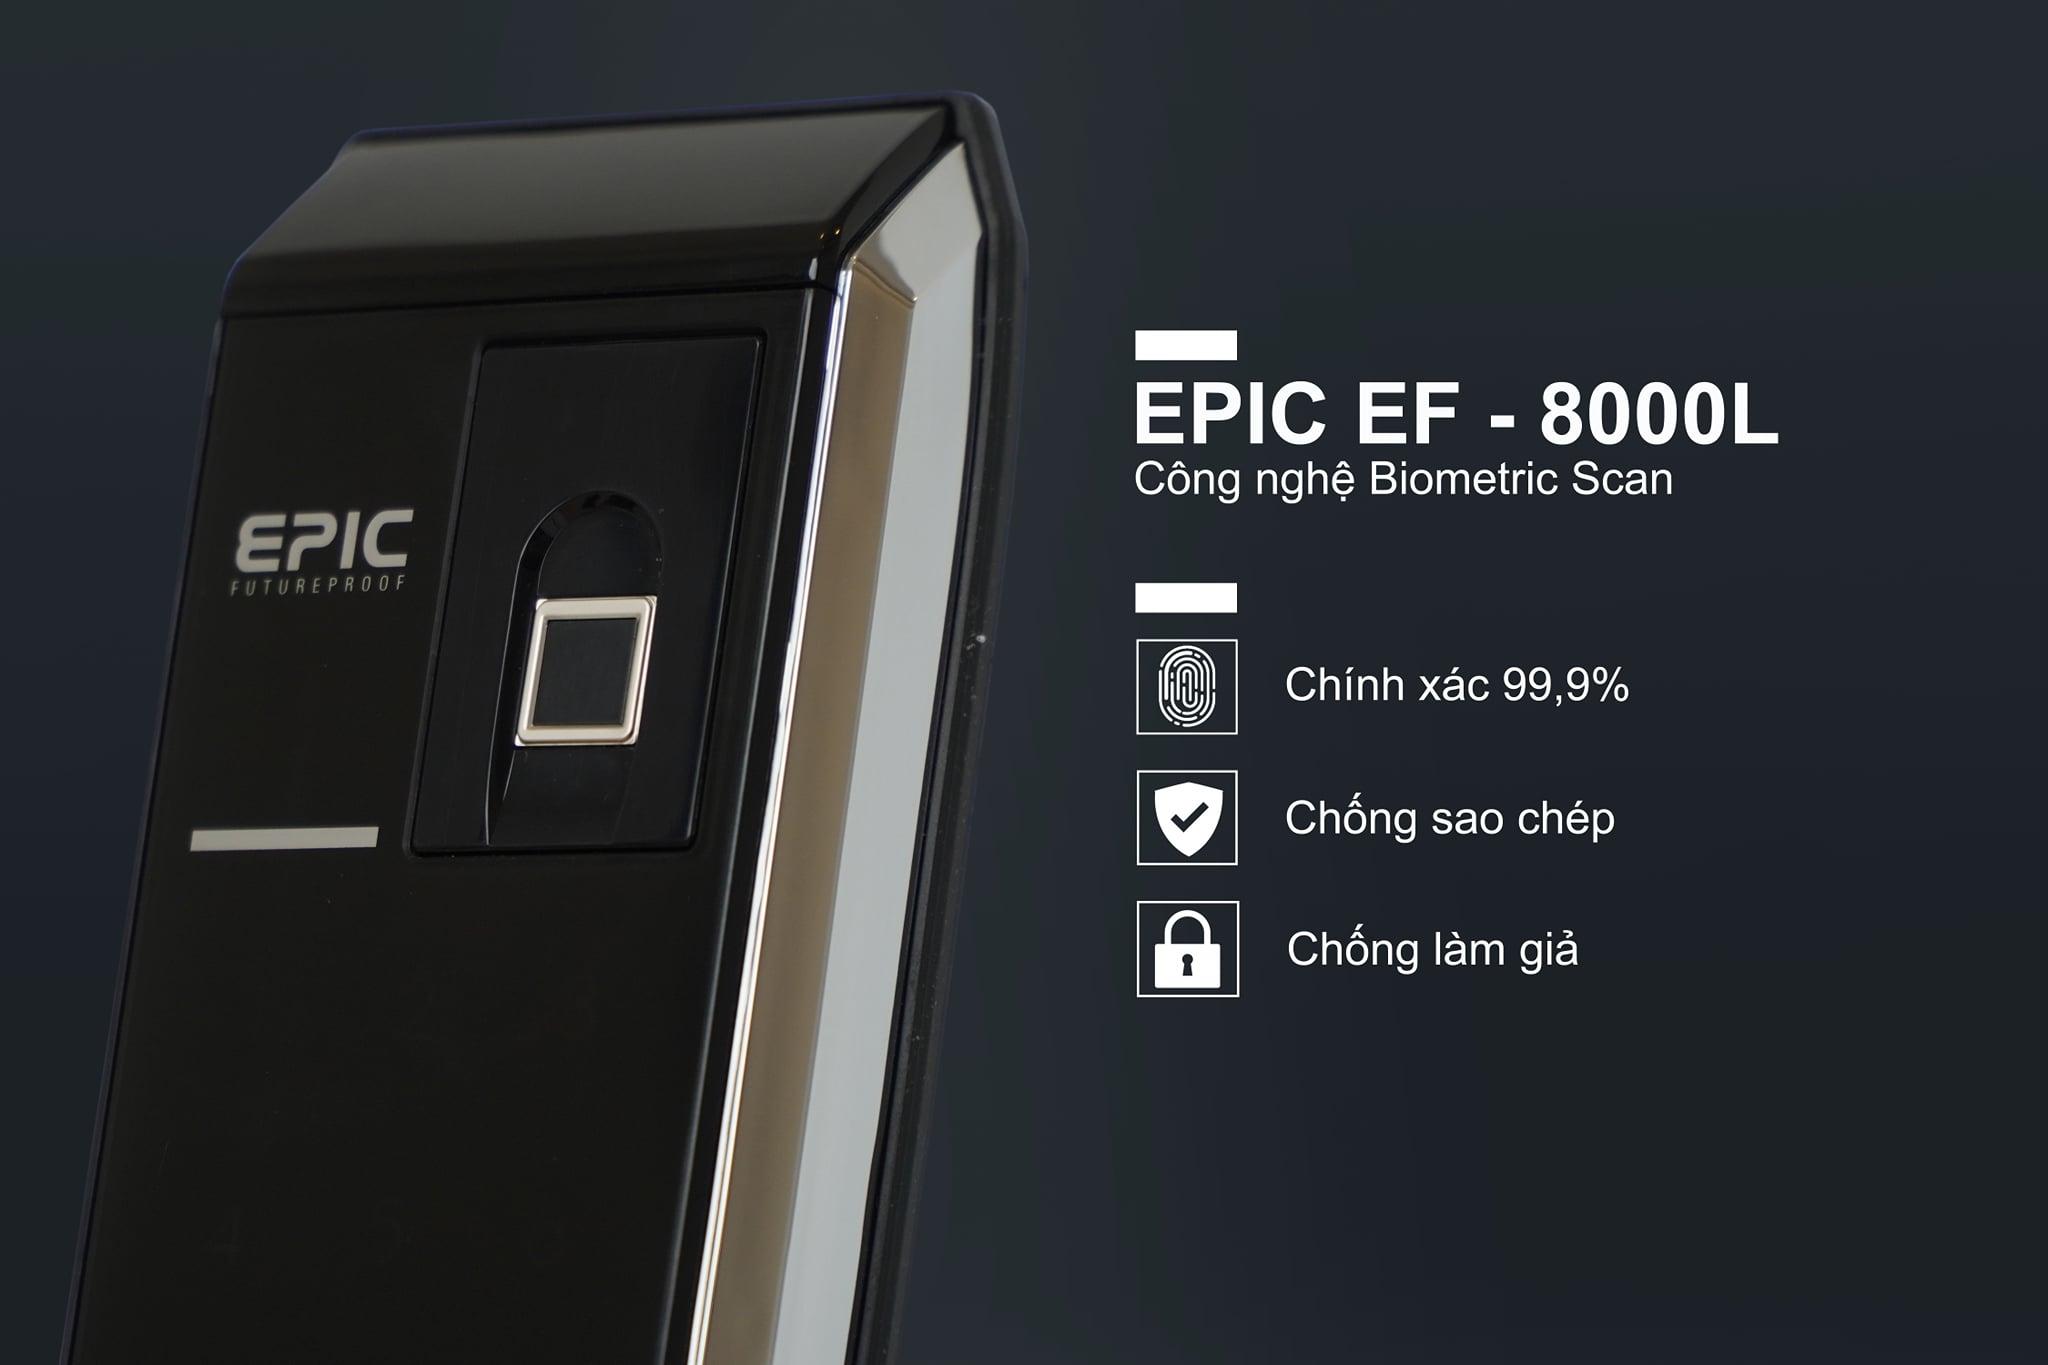 khoa-cua-dien-tu-epic-ef-8000l